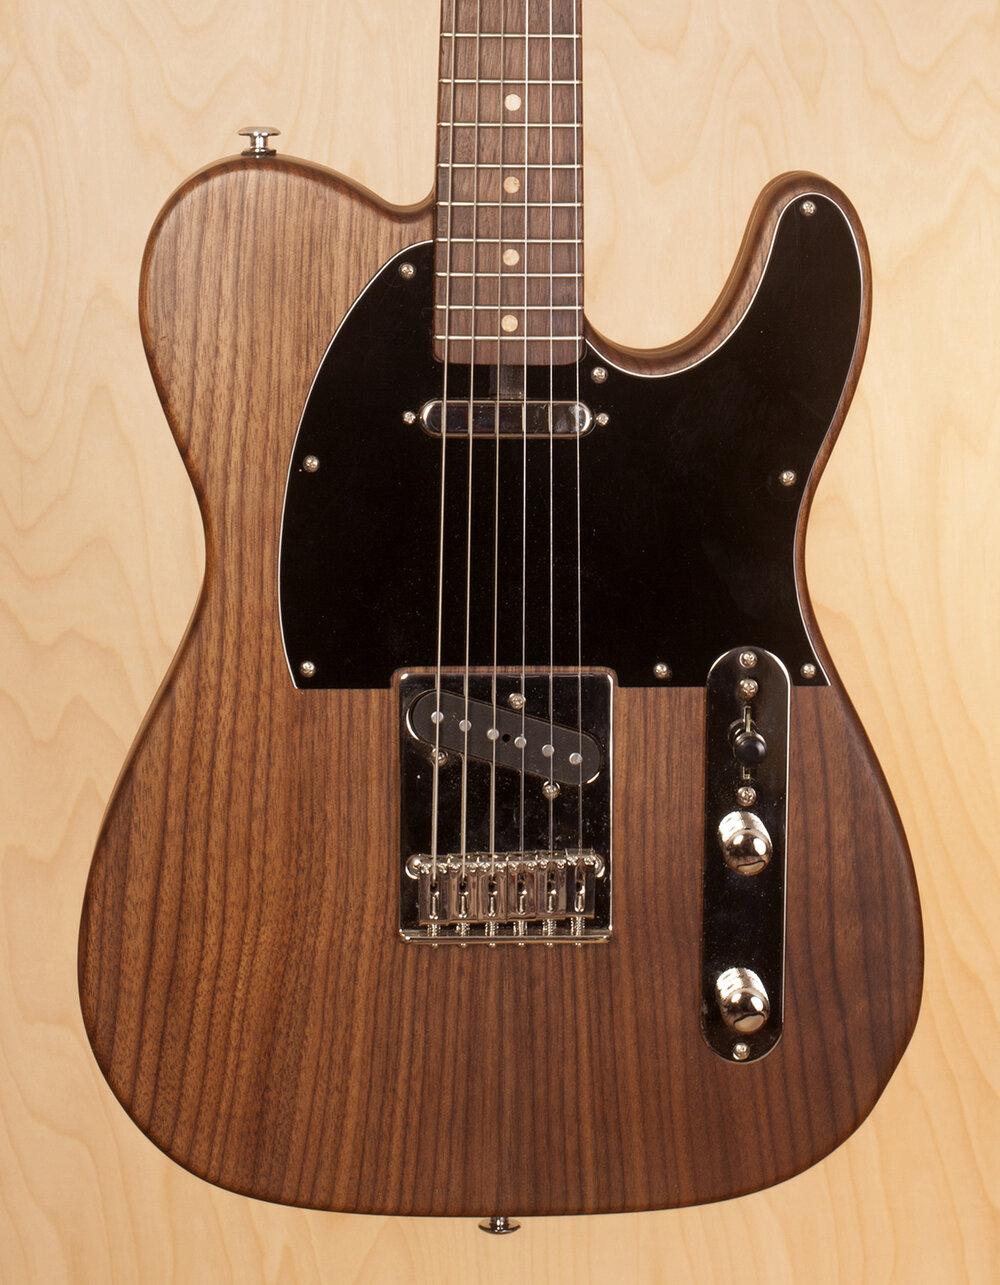 Walnut Tele Guitar